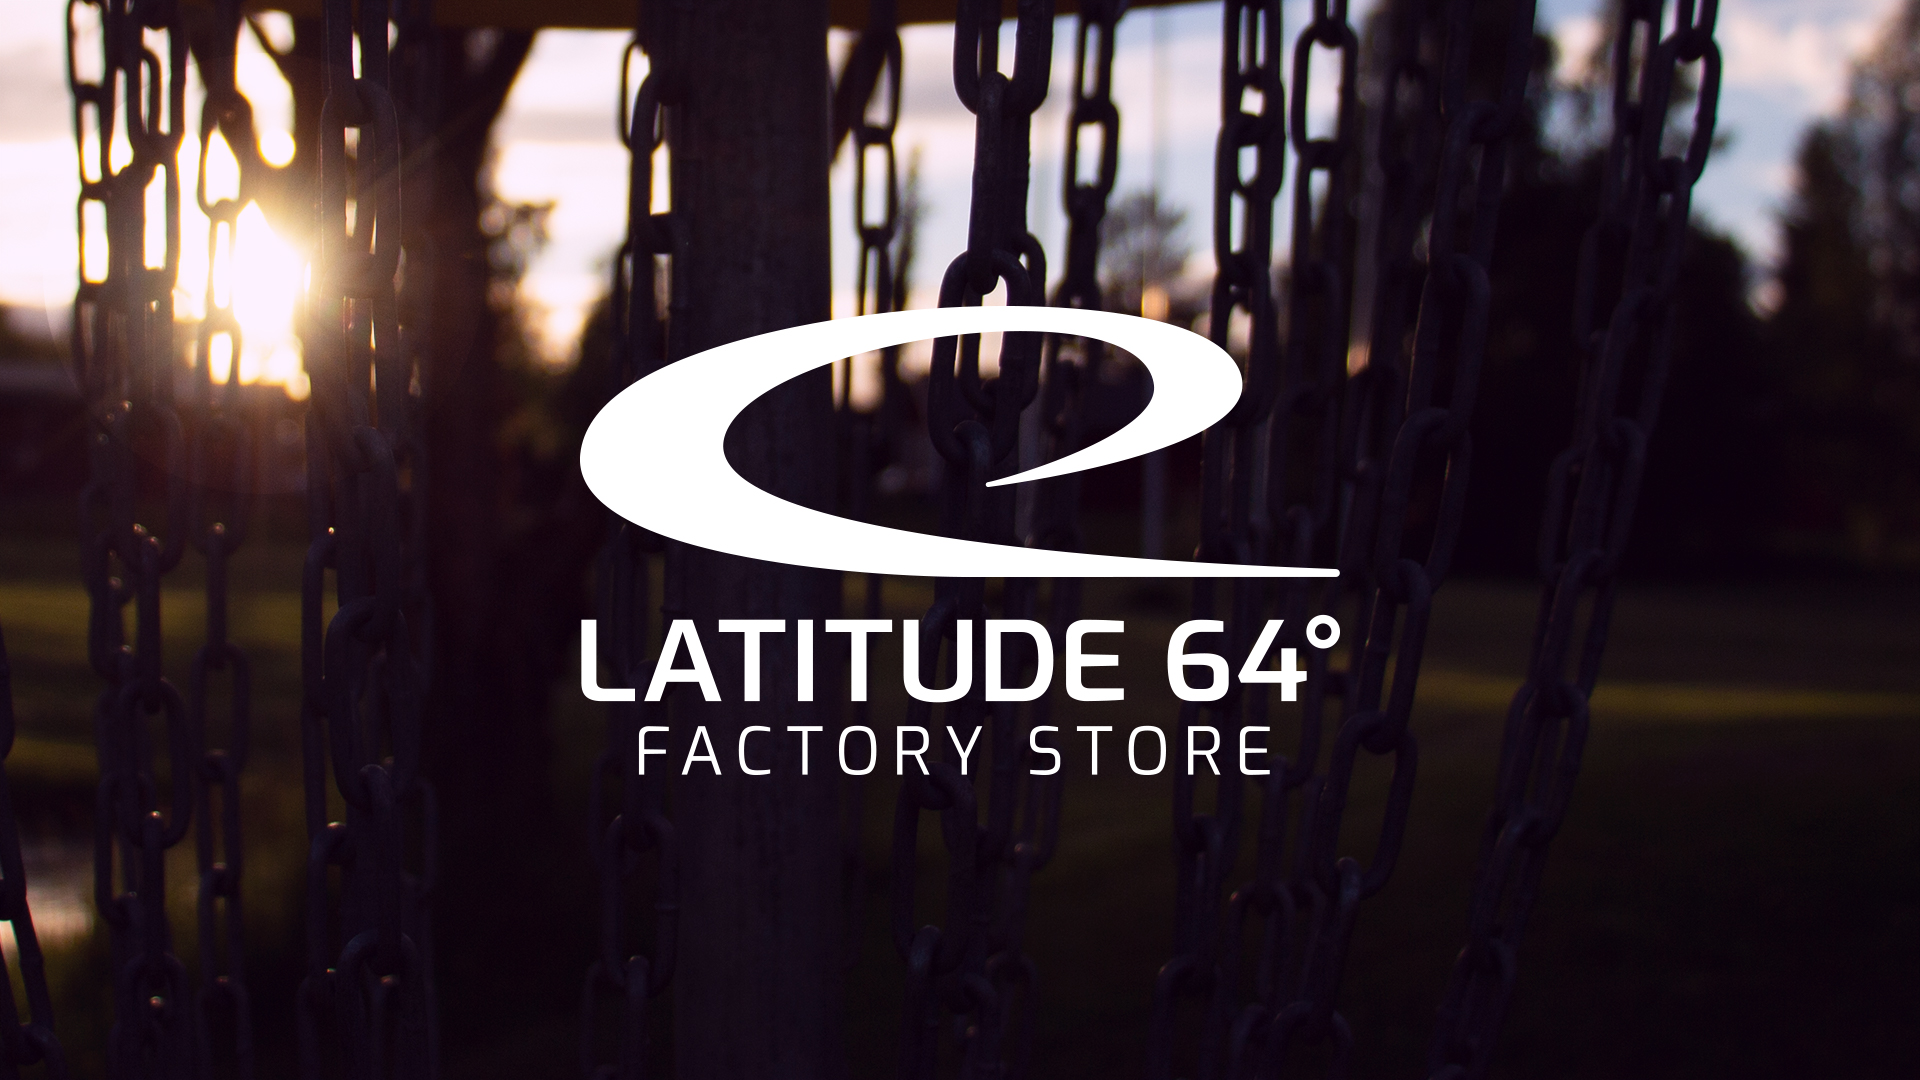 LATITUDE 64° FACTORY STORE Disc golf